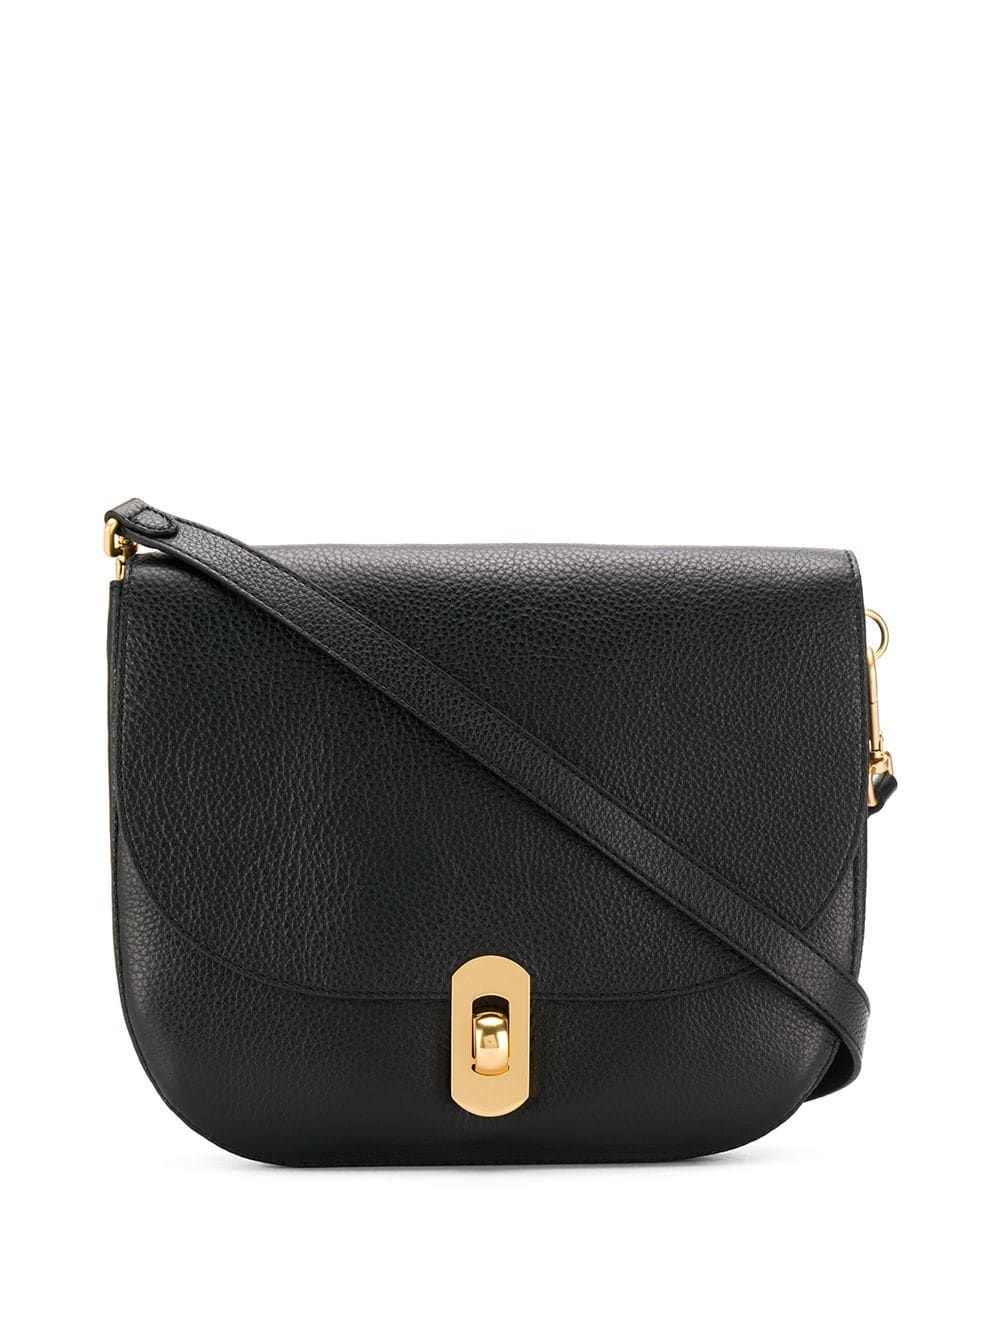 Rabatt-Verkauf neu kommen an wie man kauft Coccinelle Classic Shoulder Bag in 2019 | Products | Bags ...